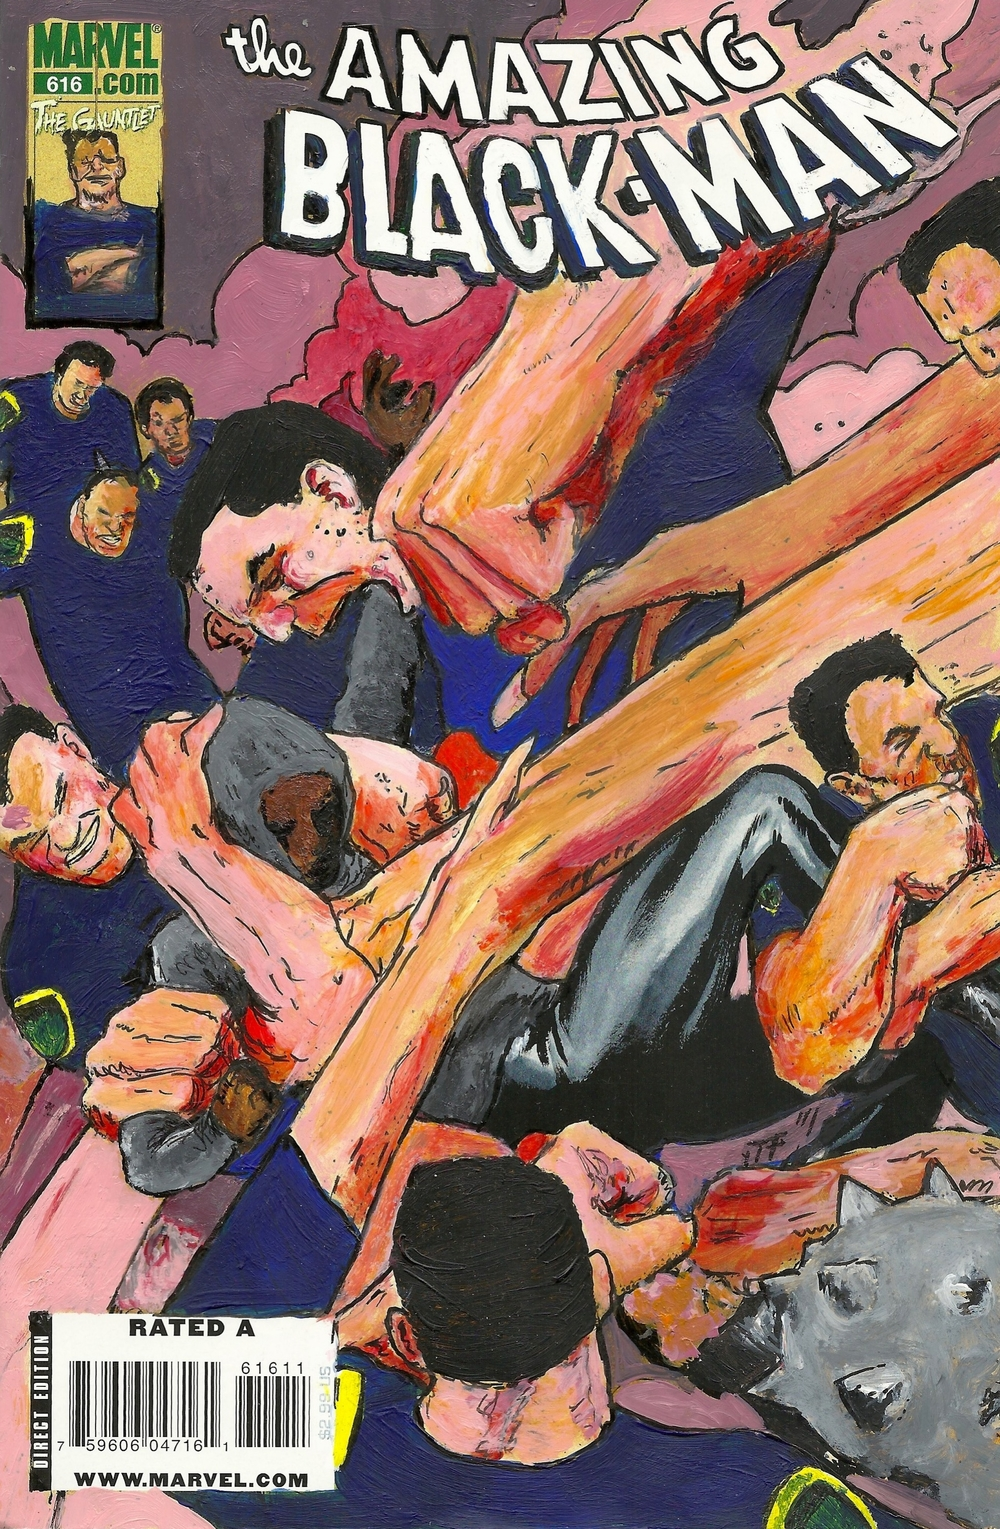 The Amazing Black-Man #616